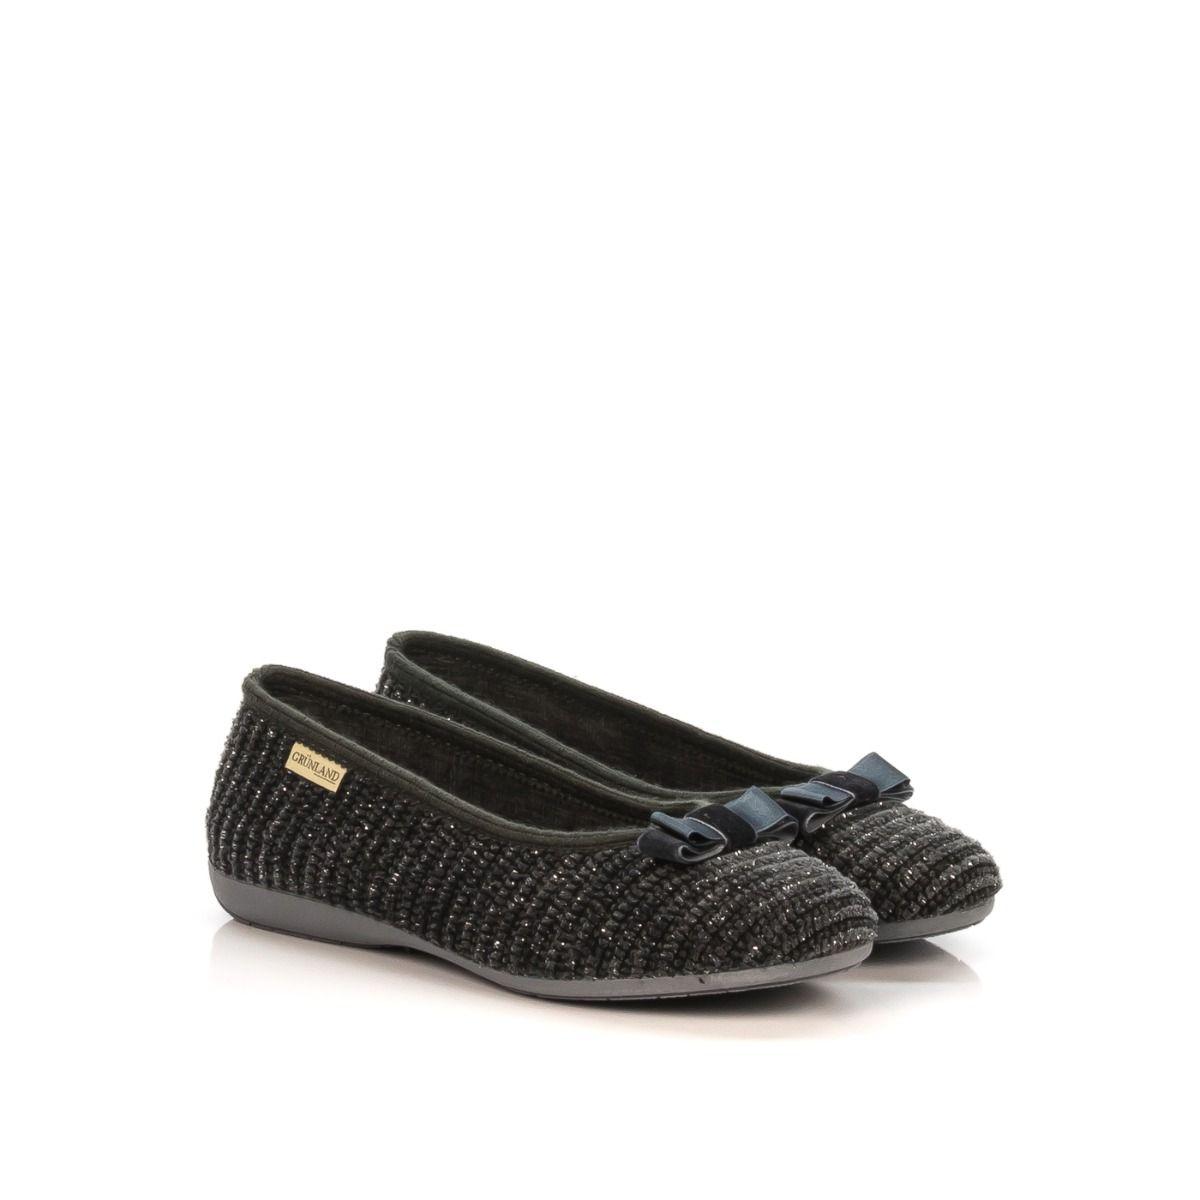 Pantofola donna 75d00bd2a6b